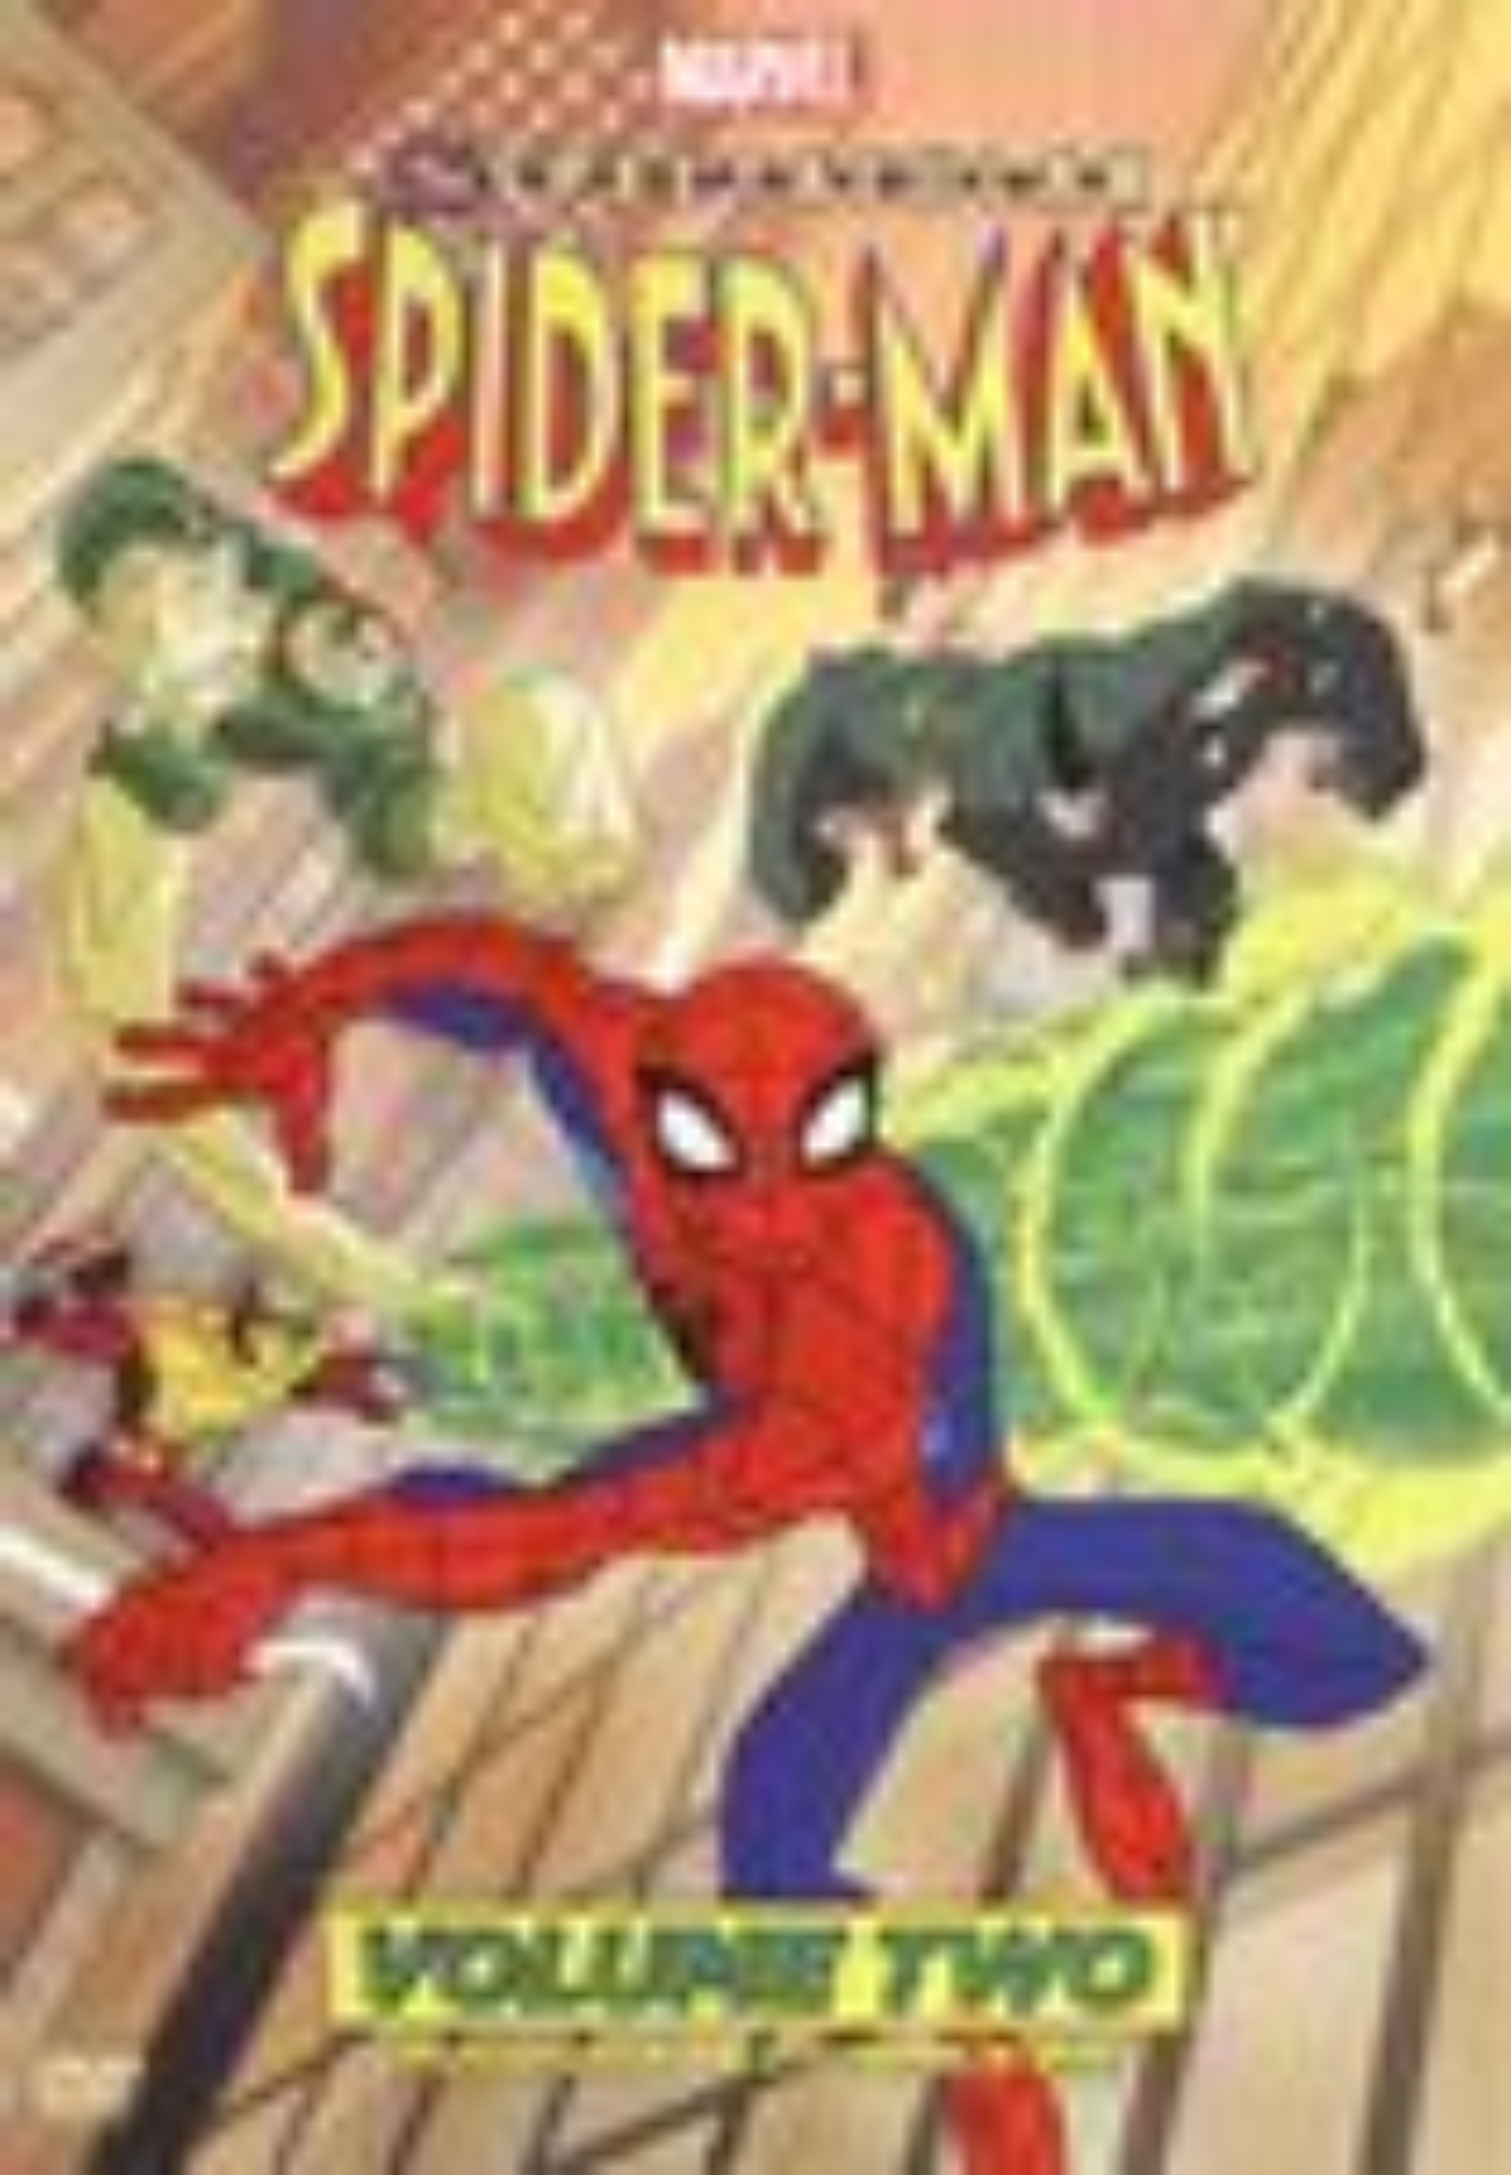 The Spectacular Spider-man, Vol. 2 (dvd) 9214575